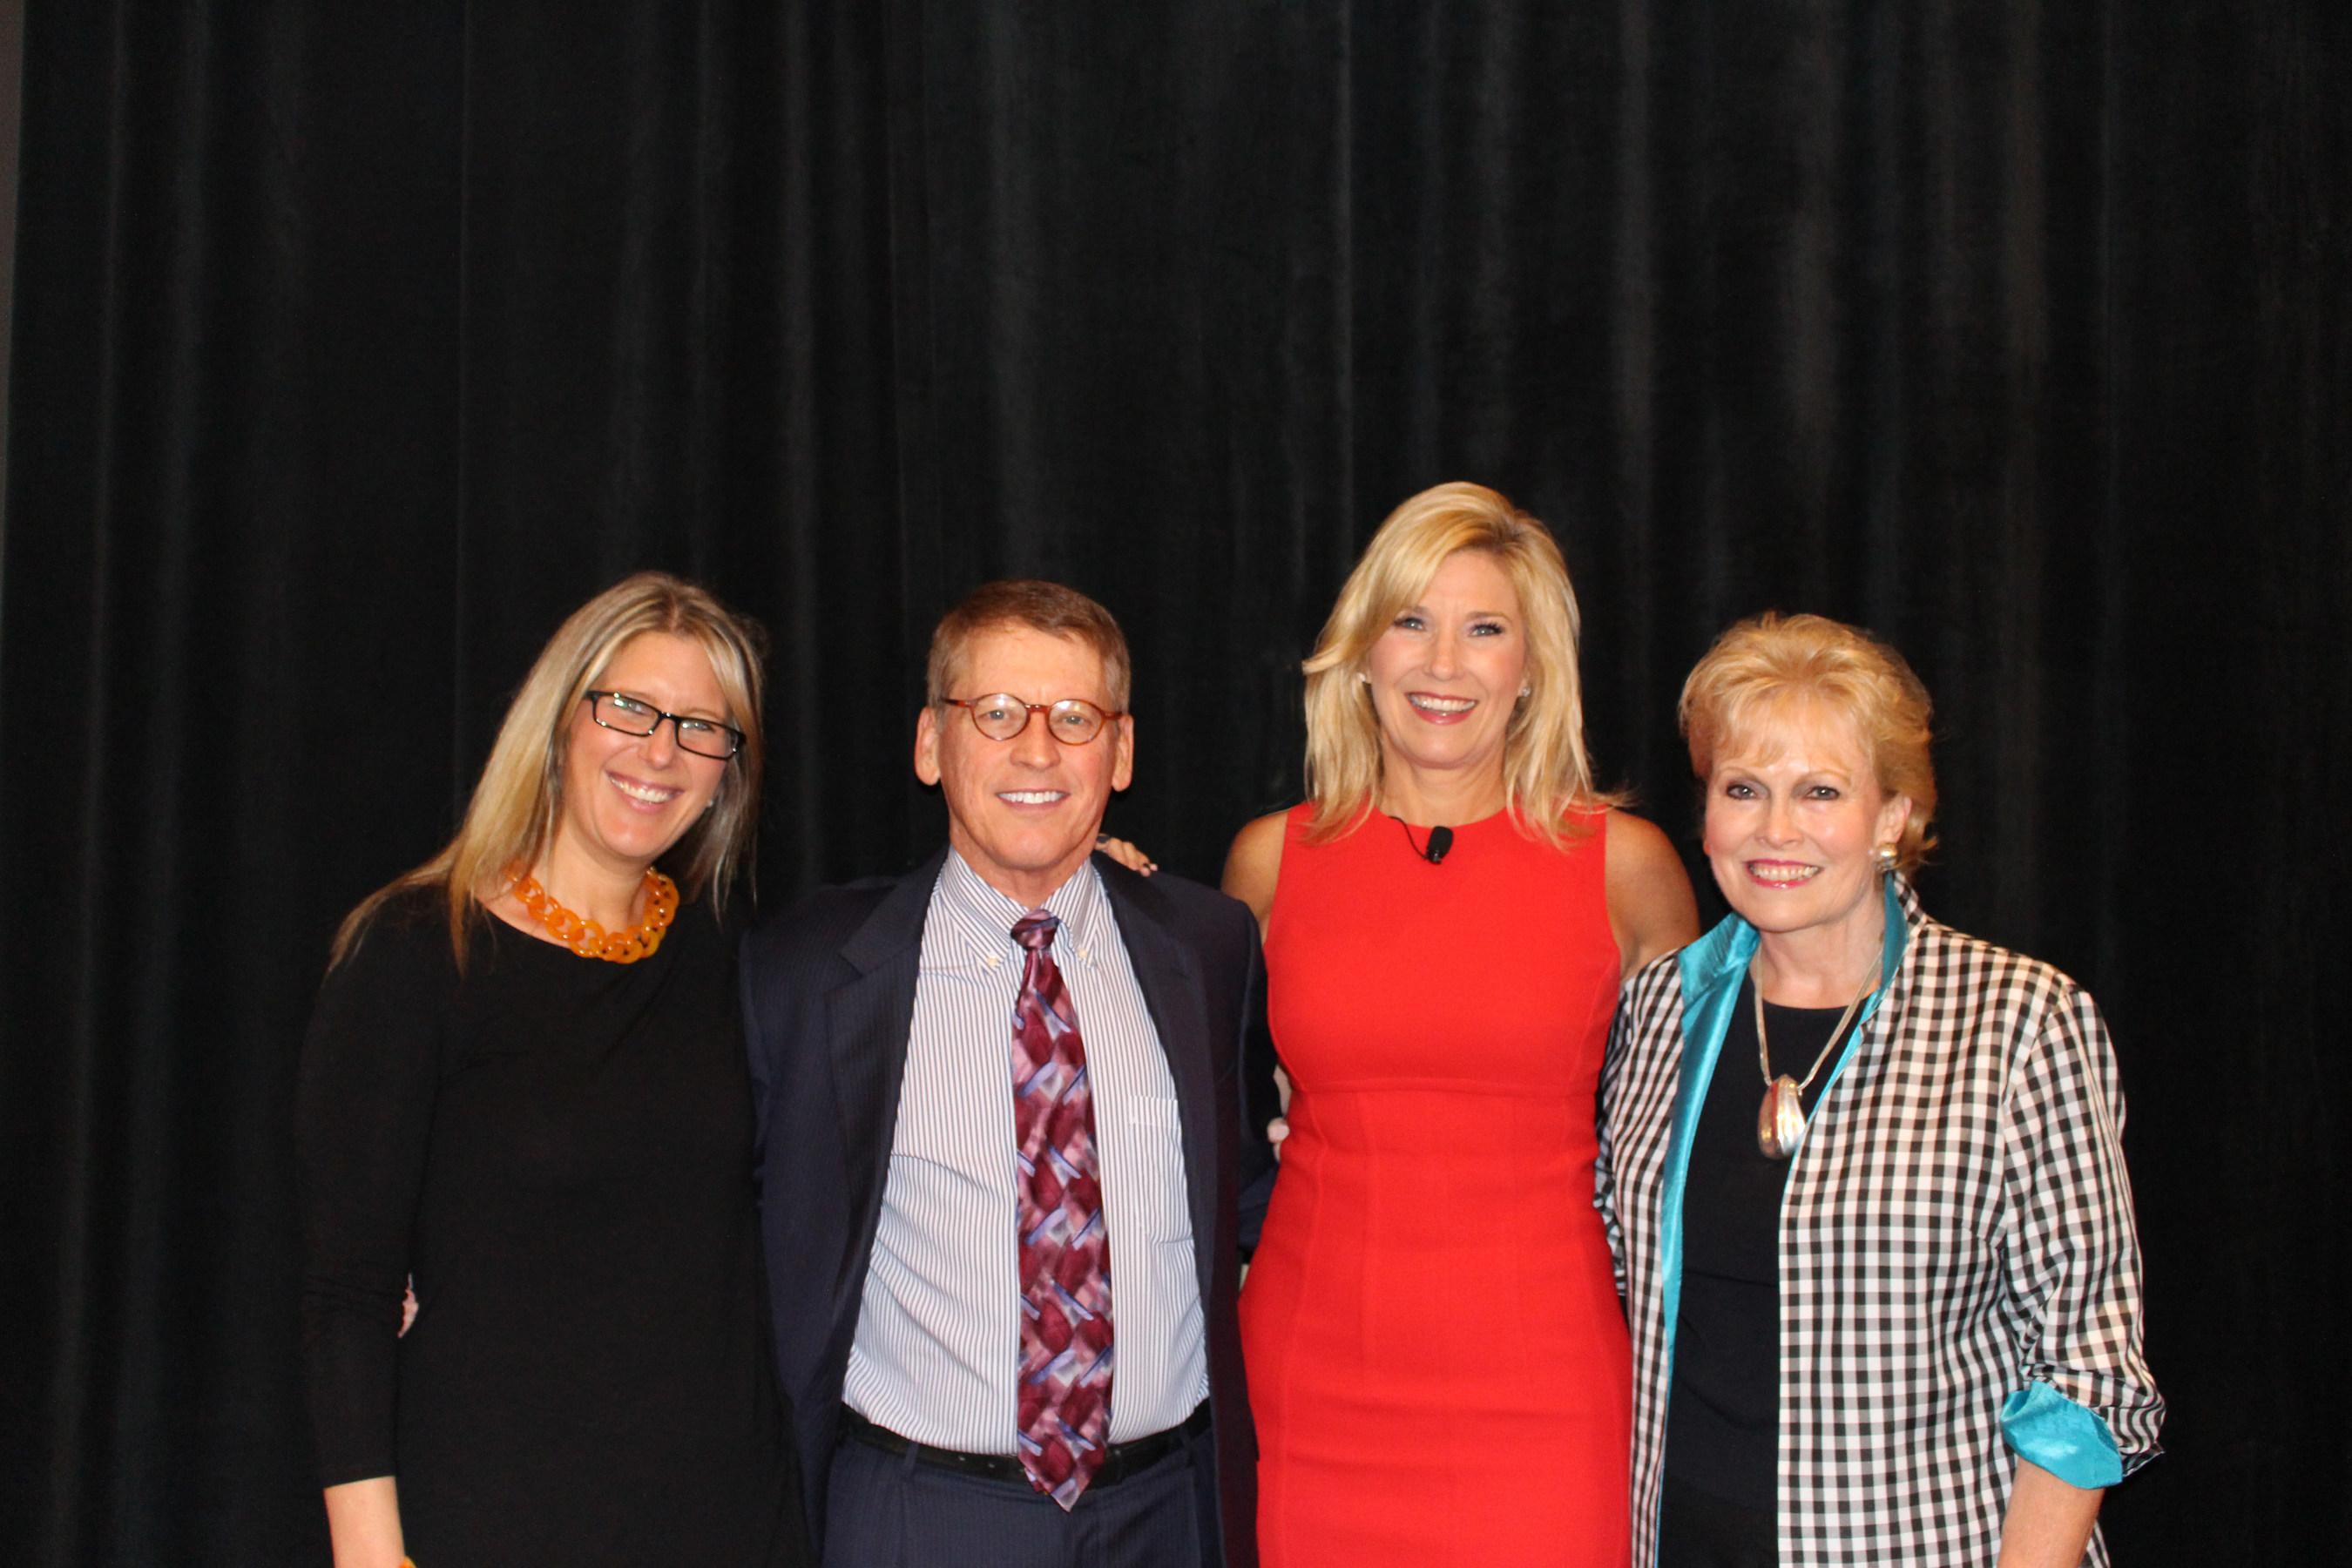 Internationally-recognized Speakers Join John R. Wood Properties' 2015 Sales Kick-off Event